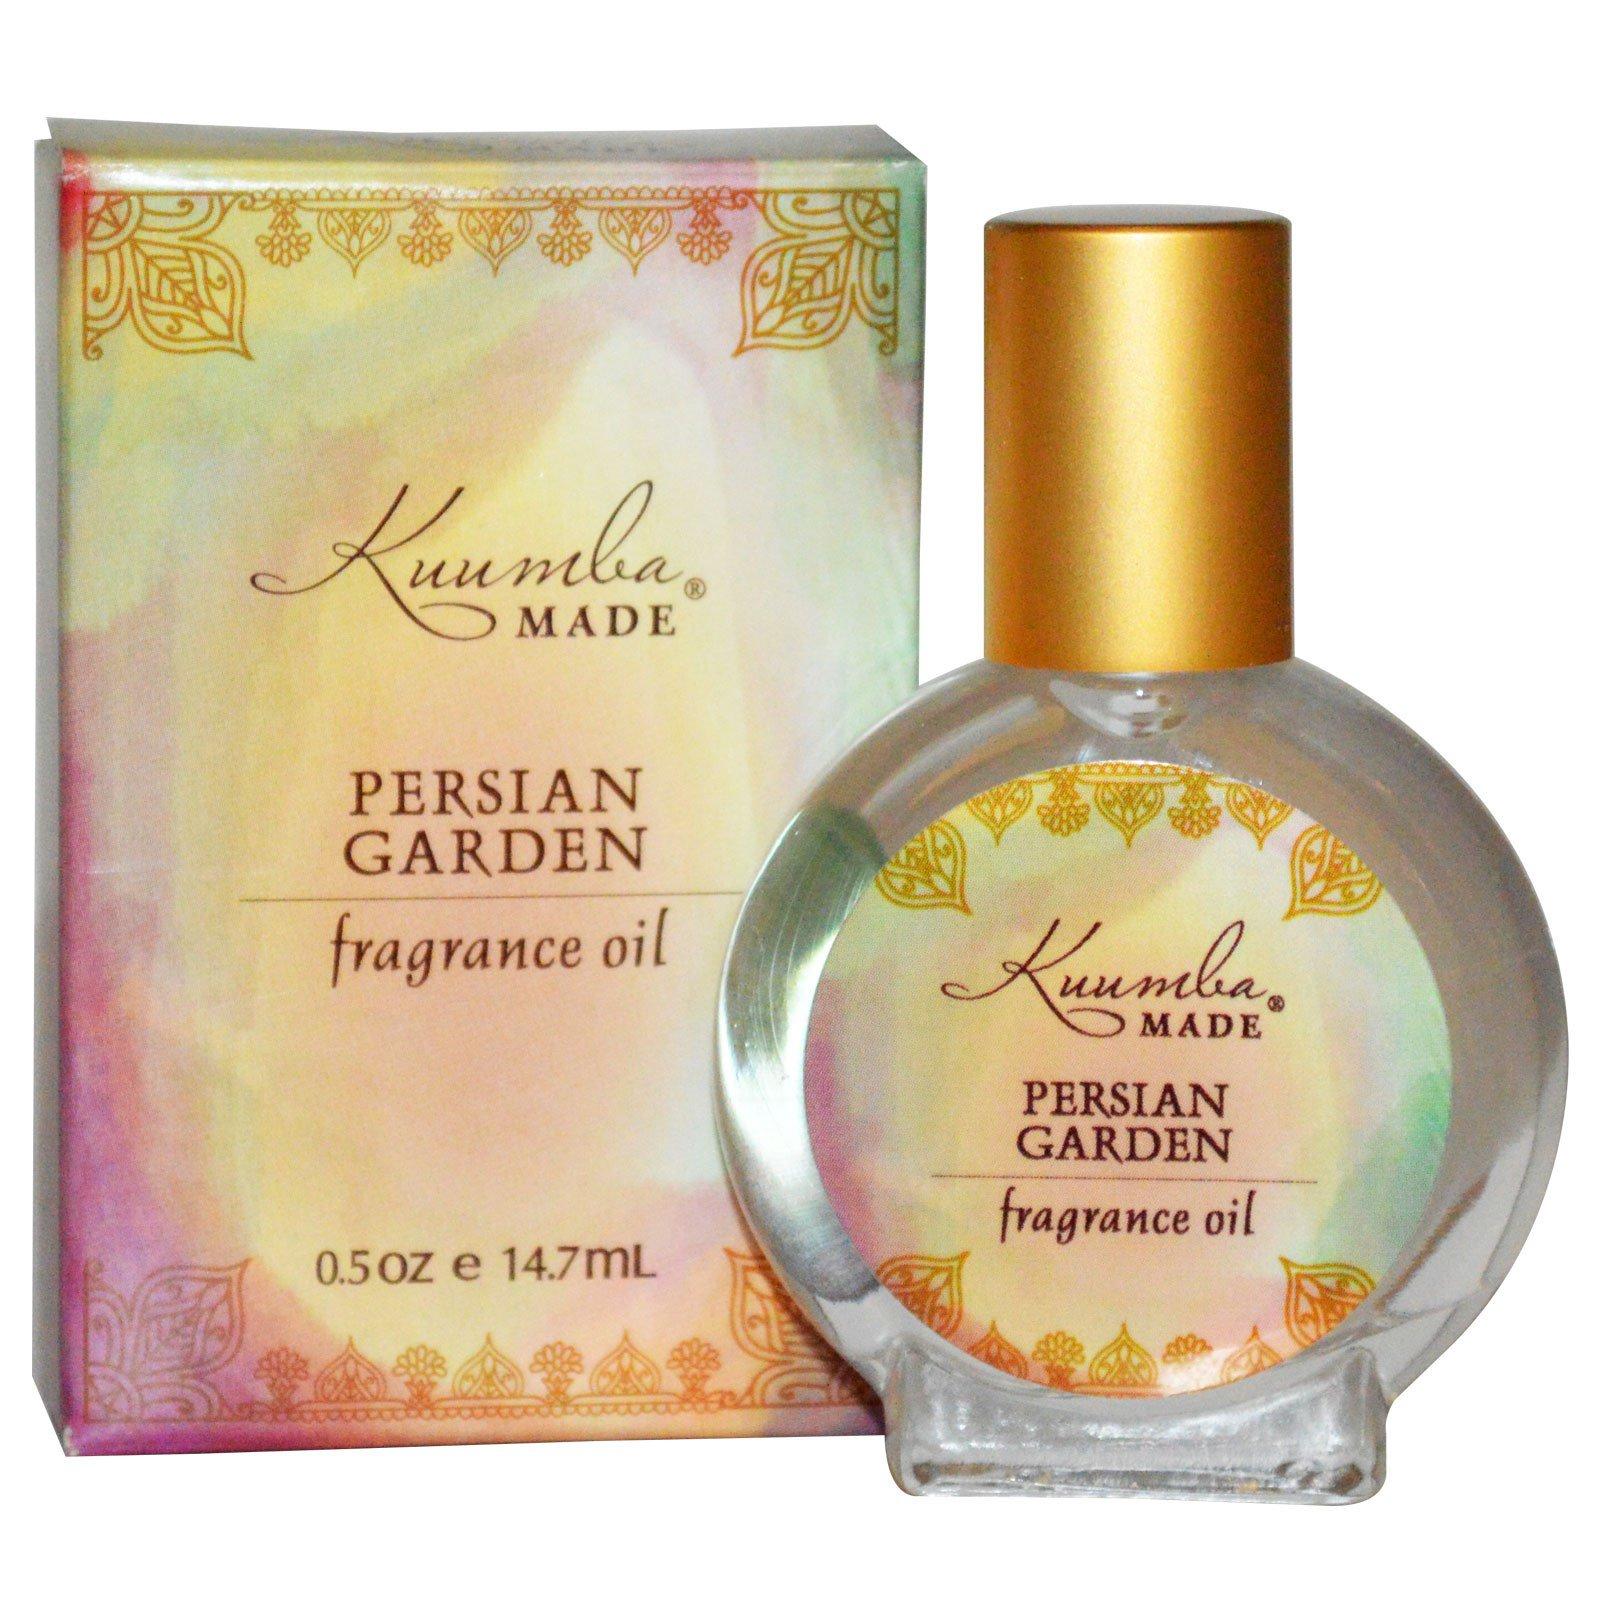 Kuumba Made, Ароматическое масло персидский сад, 14,7 мл